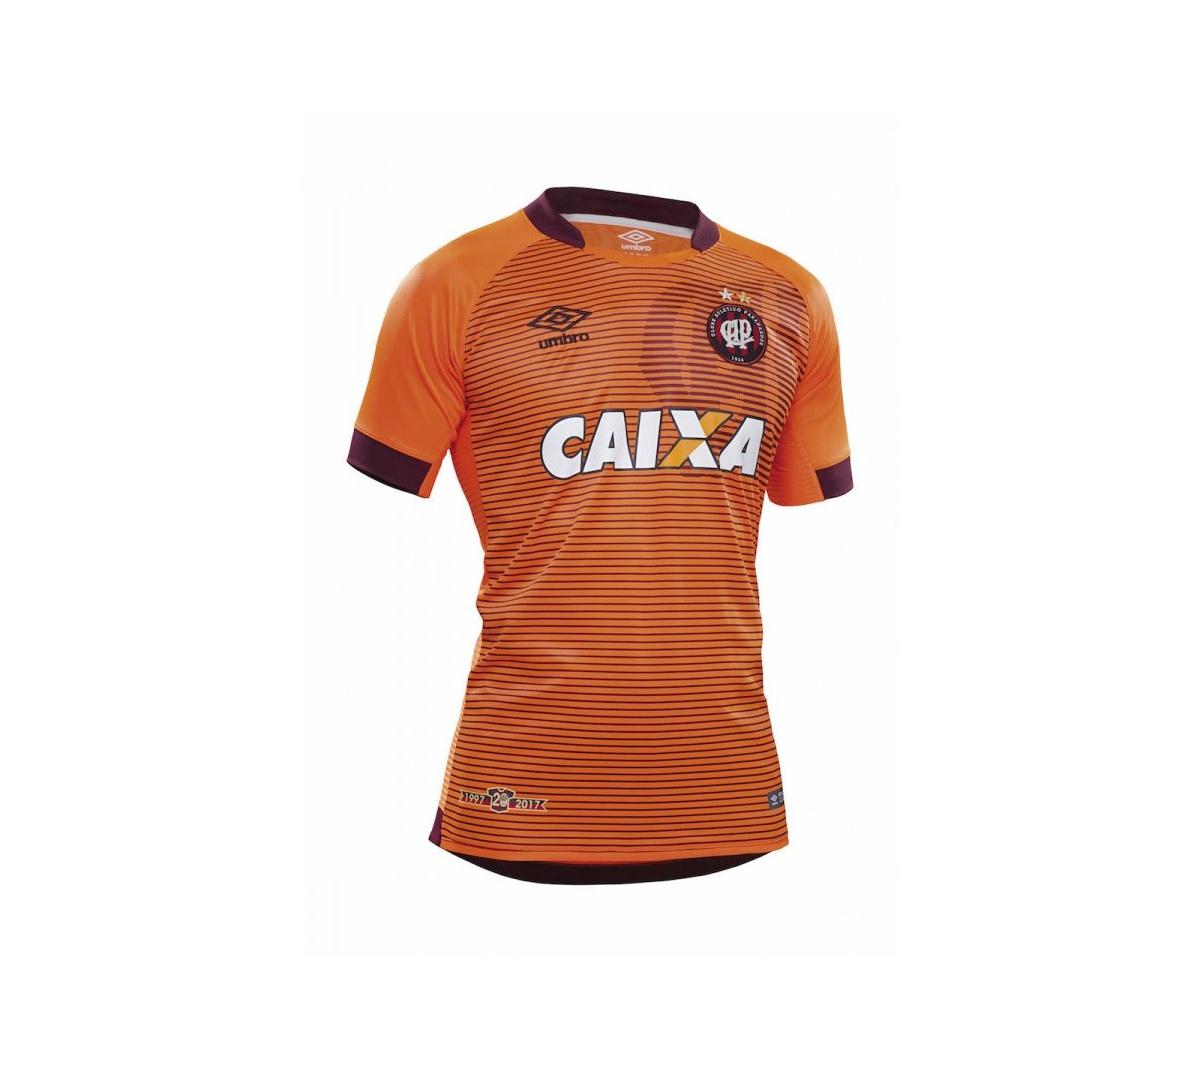 Camisa Atlético Paranaense II Umbro 2017/18